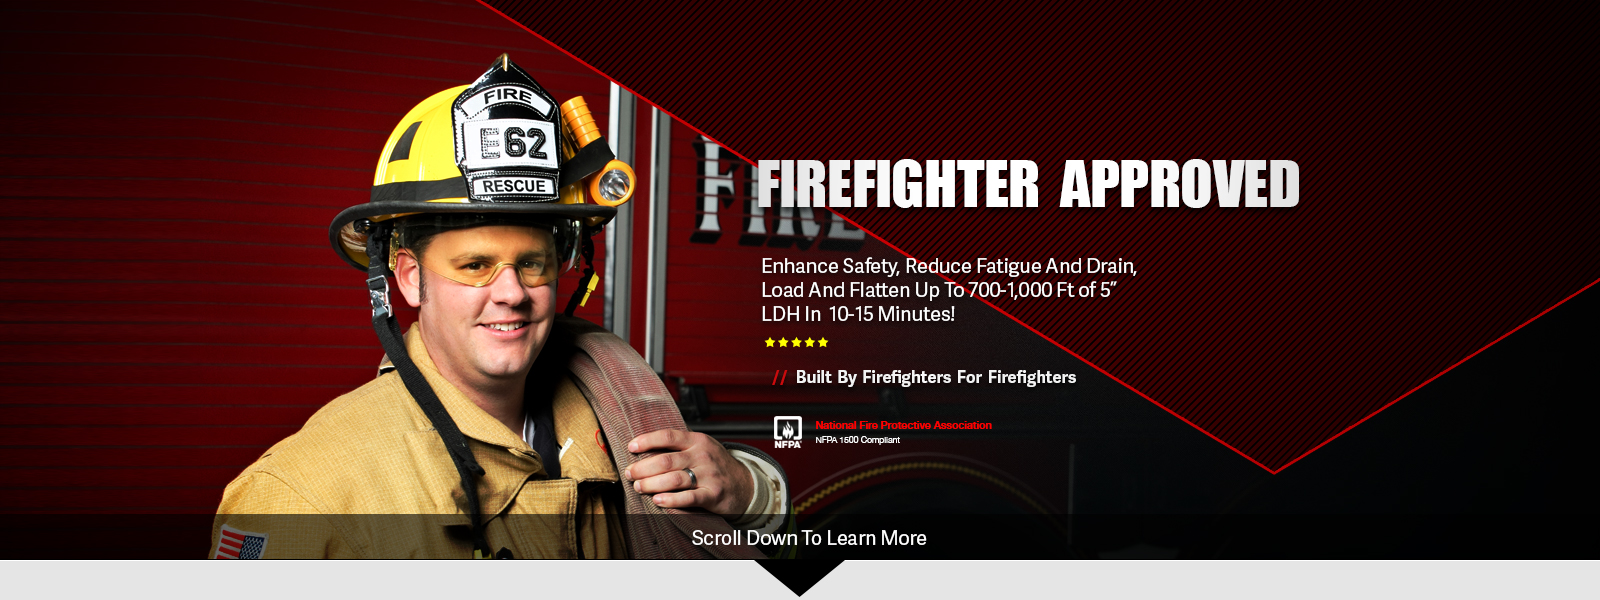 Hose-Mule-Firefighter-Approved.jpg